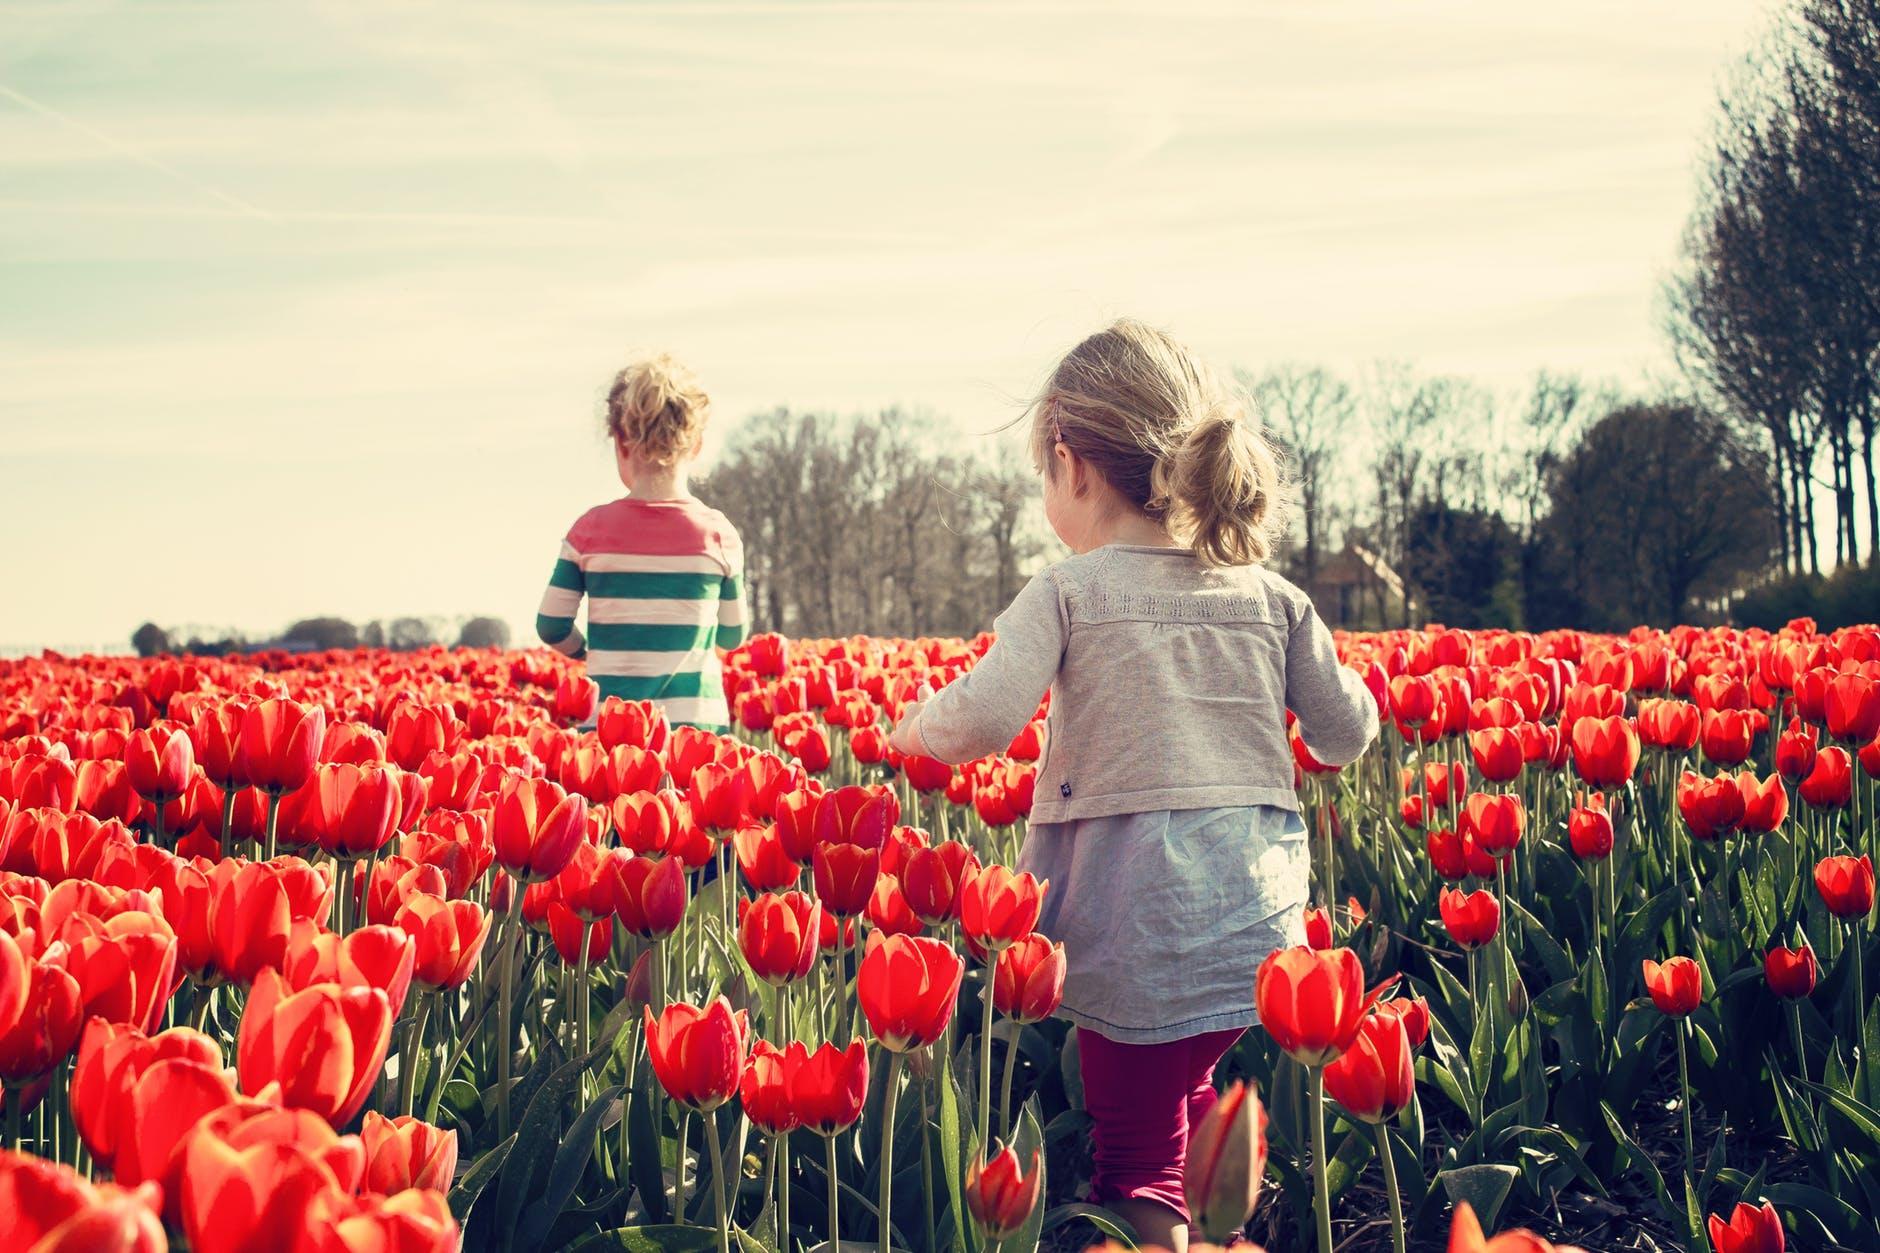 girls-children-tulips-netherlands.jpg